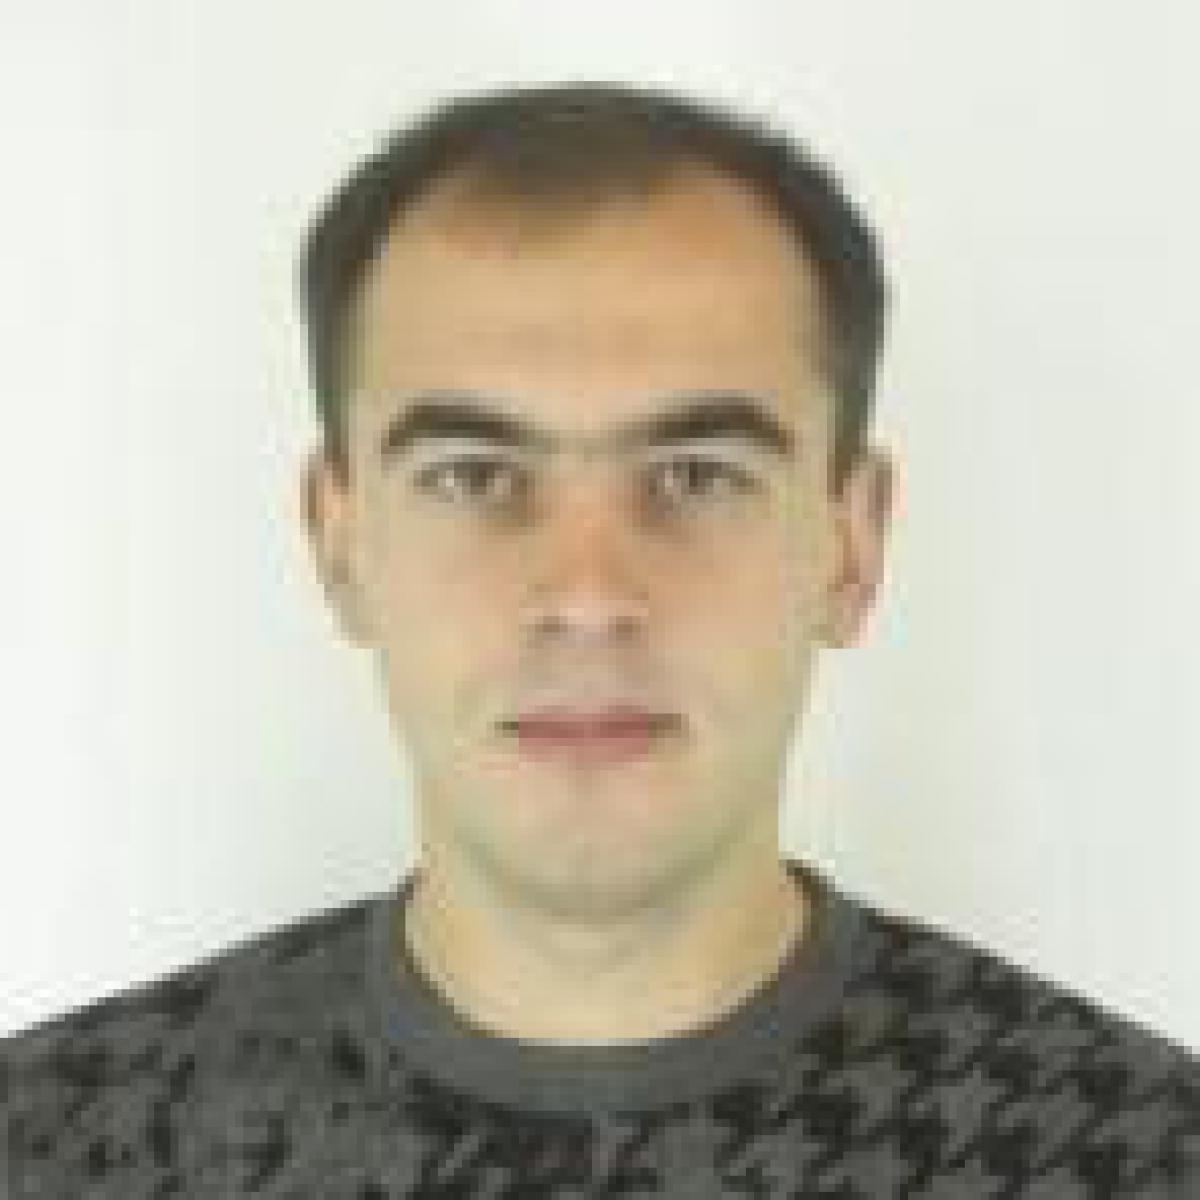 Лизун Іван Миколайович